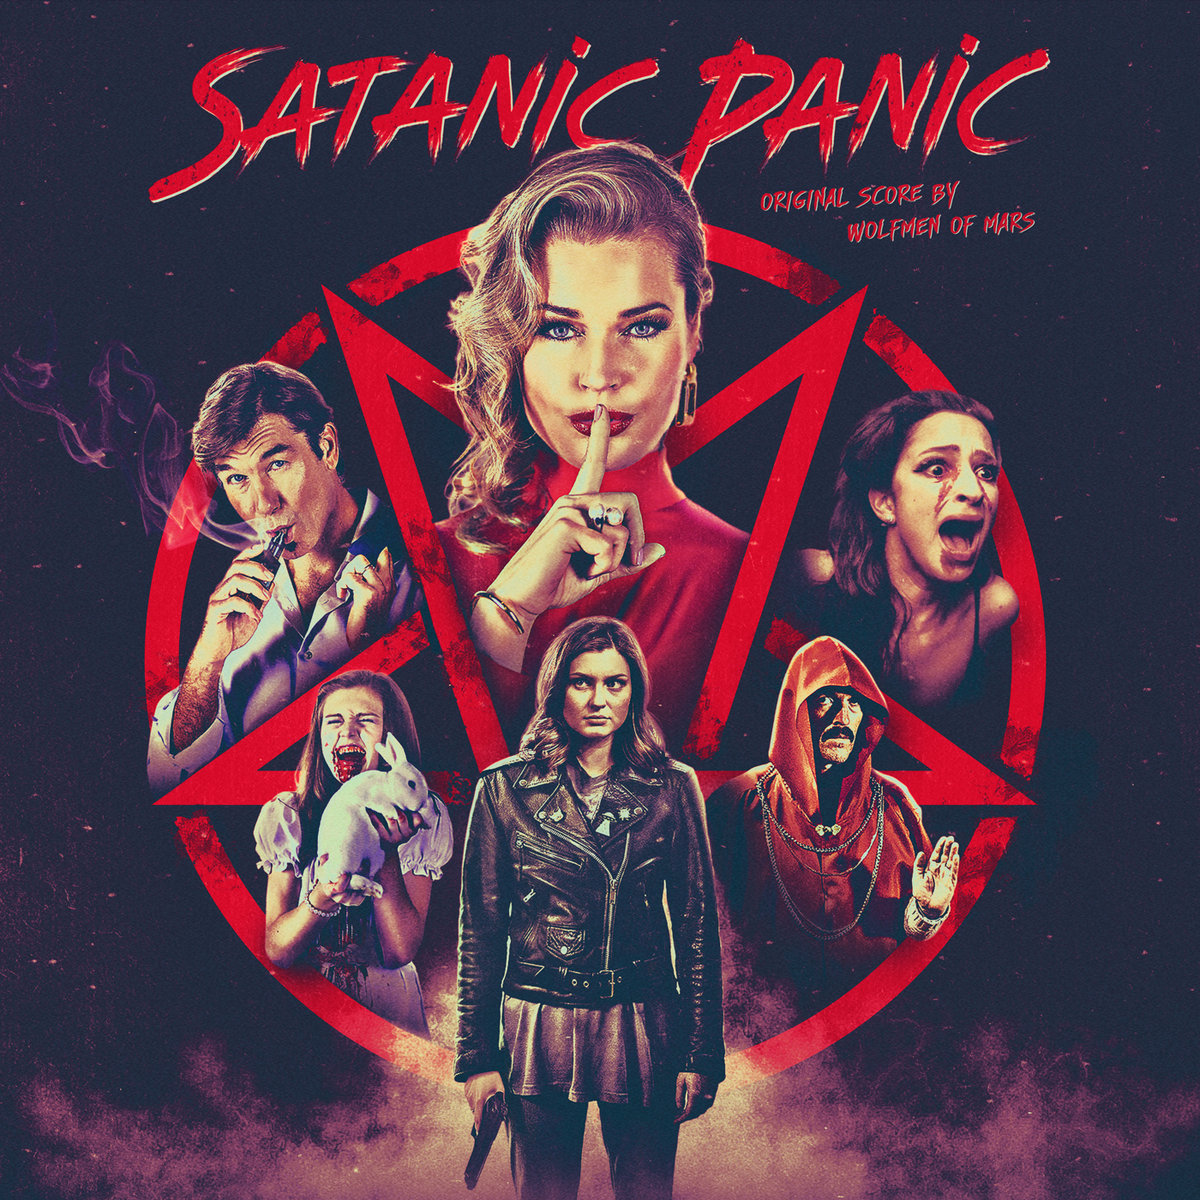 Satanist dating UK